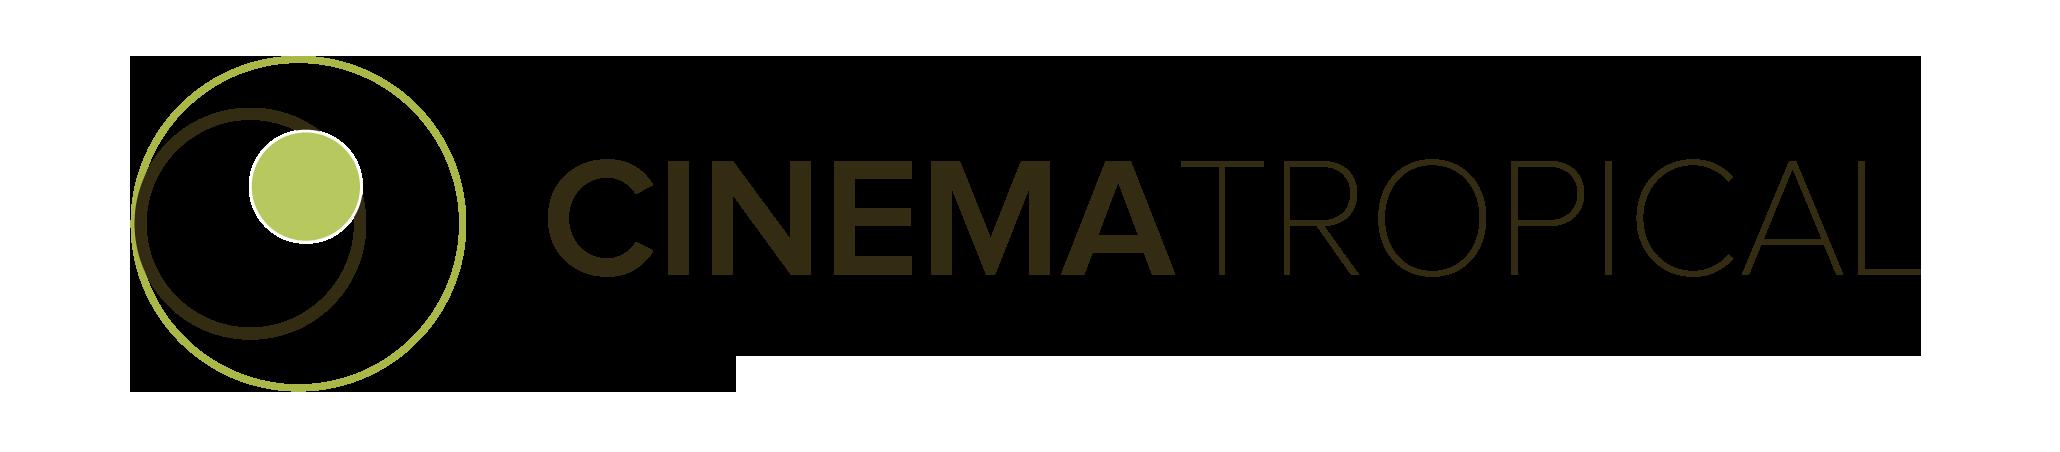 Events — Cinema Tropical